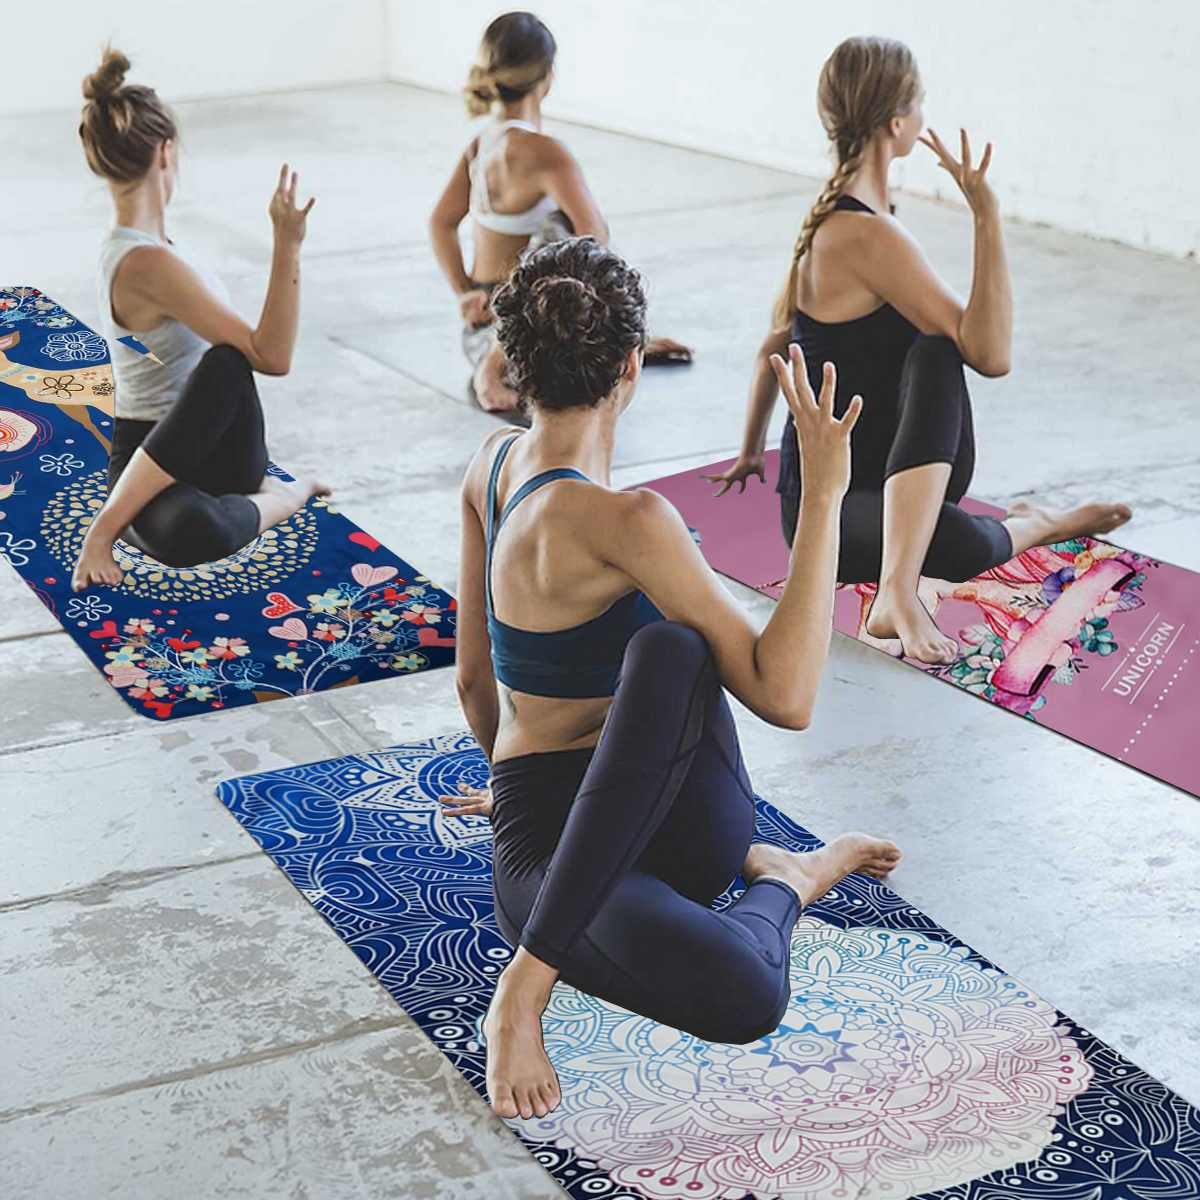 68*183cm Non Slip Yoga Mat Microfiber Towel Fitness Gym Exercise Fitness Pilates Workout Blanket